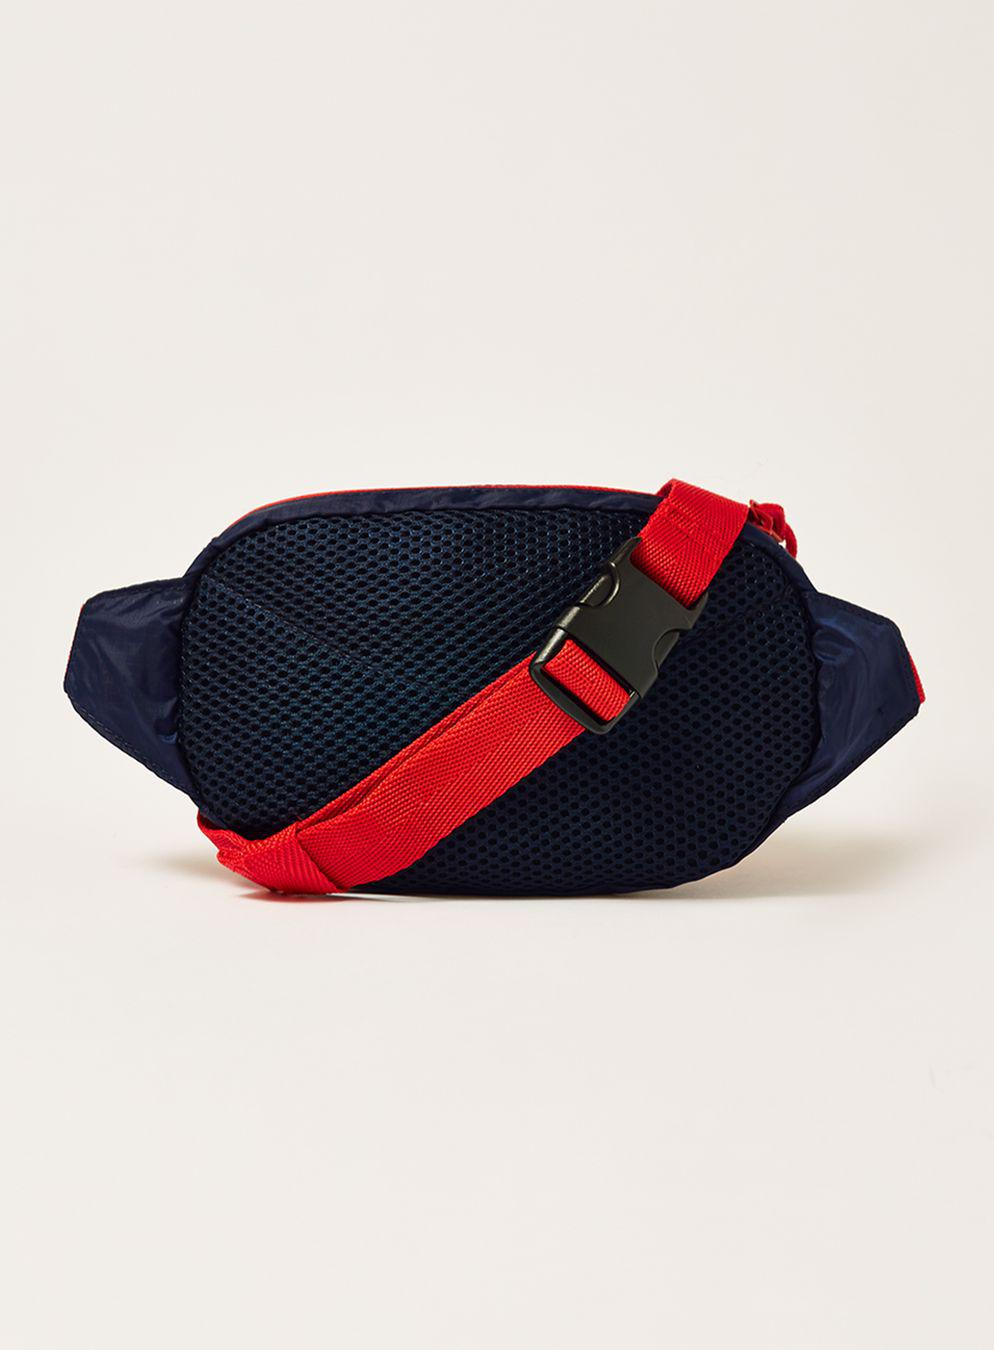 TOPMAN Synthetic Cross Body Bag In in Red for Men